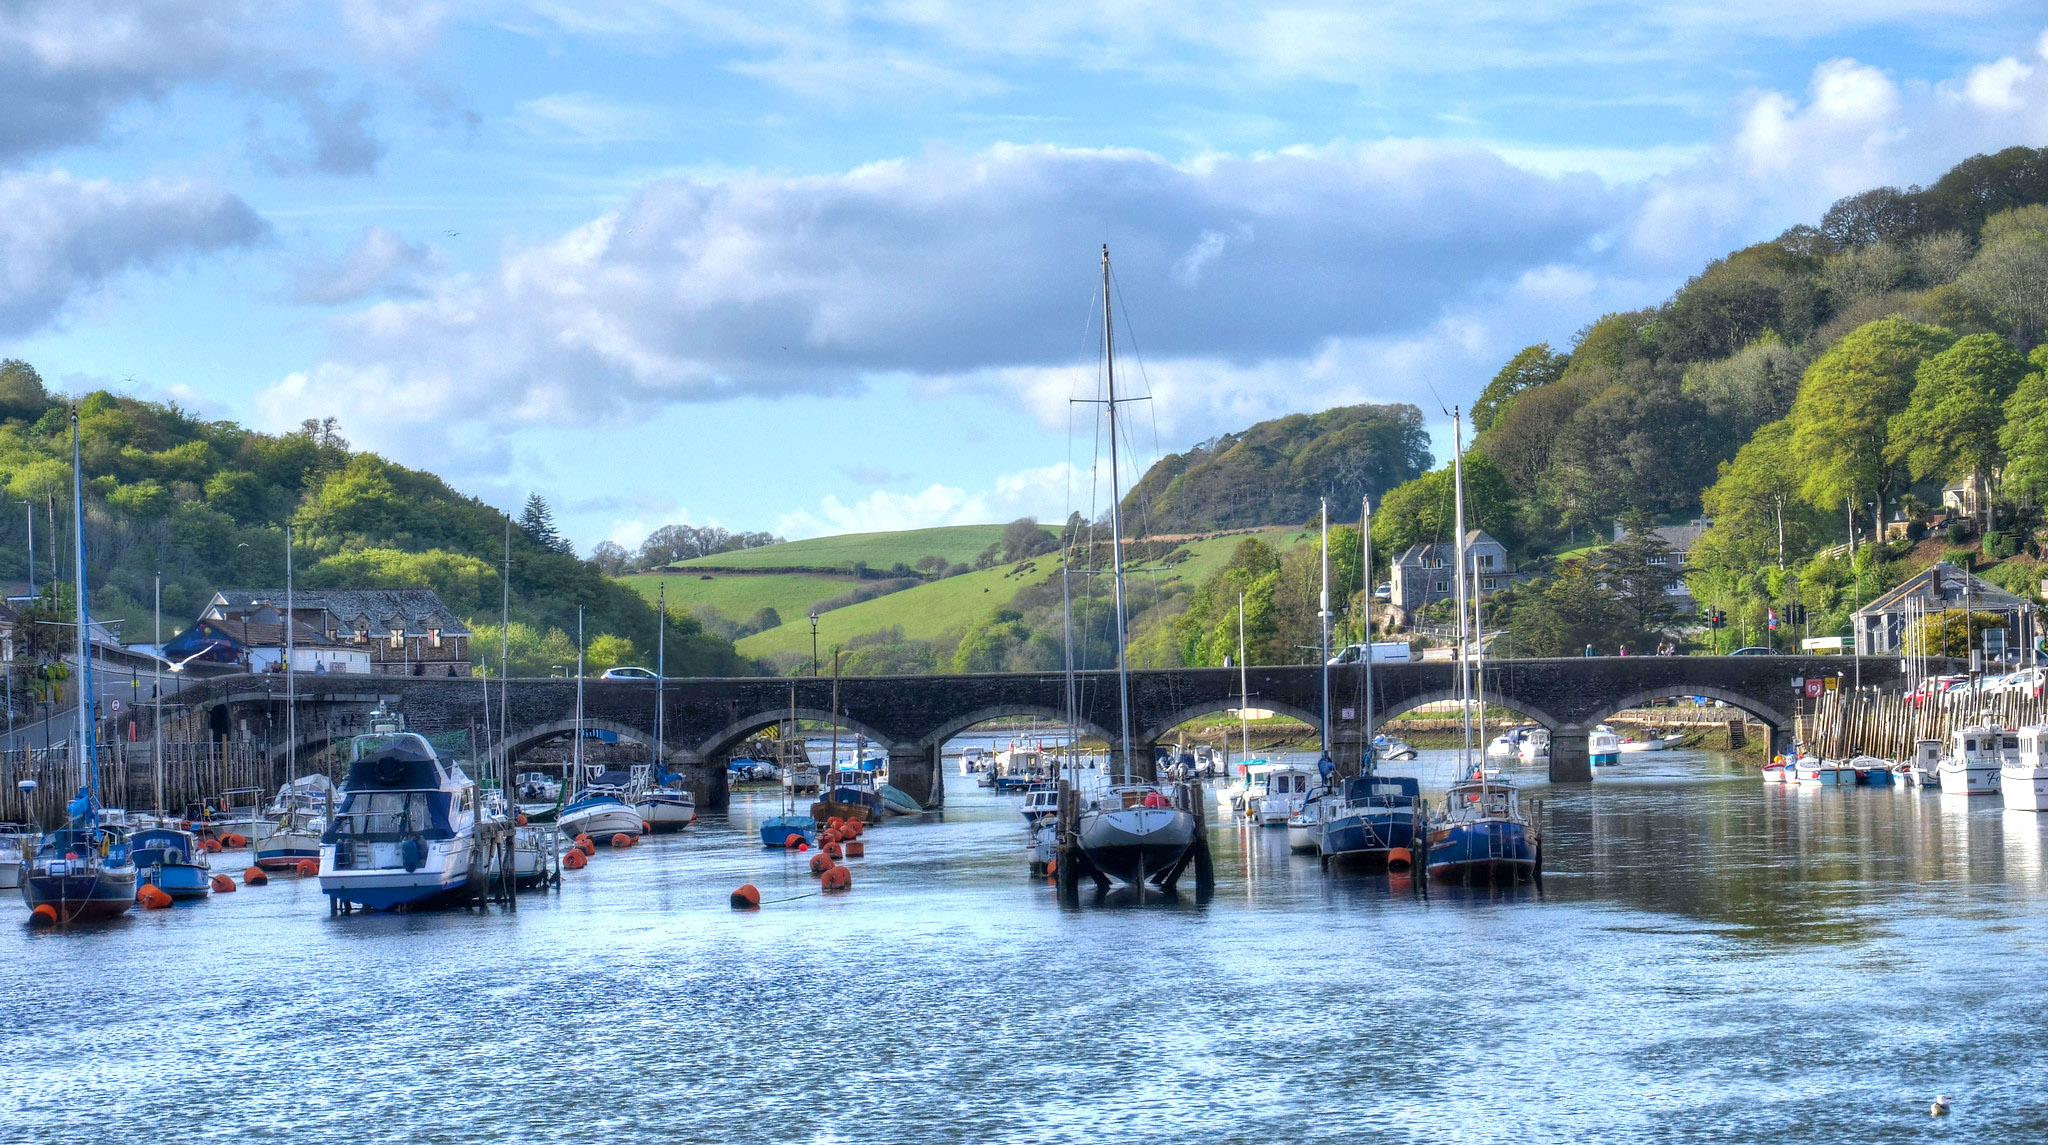 The river at Looe, Cornwall by Baz Richardson.jpg